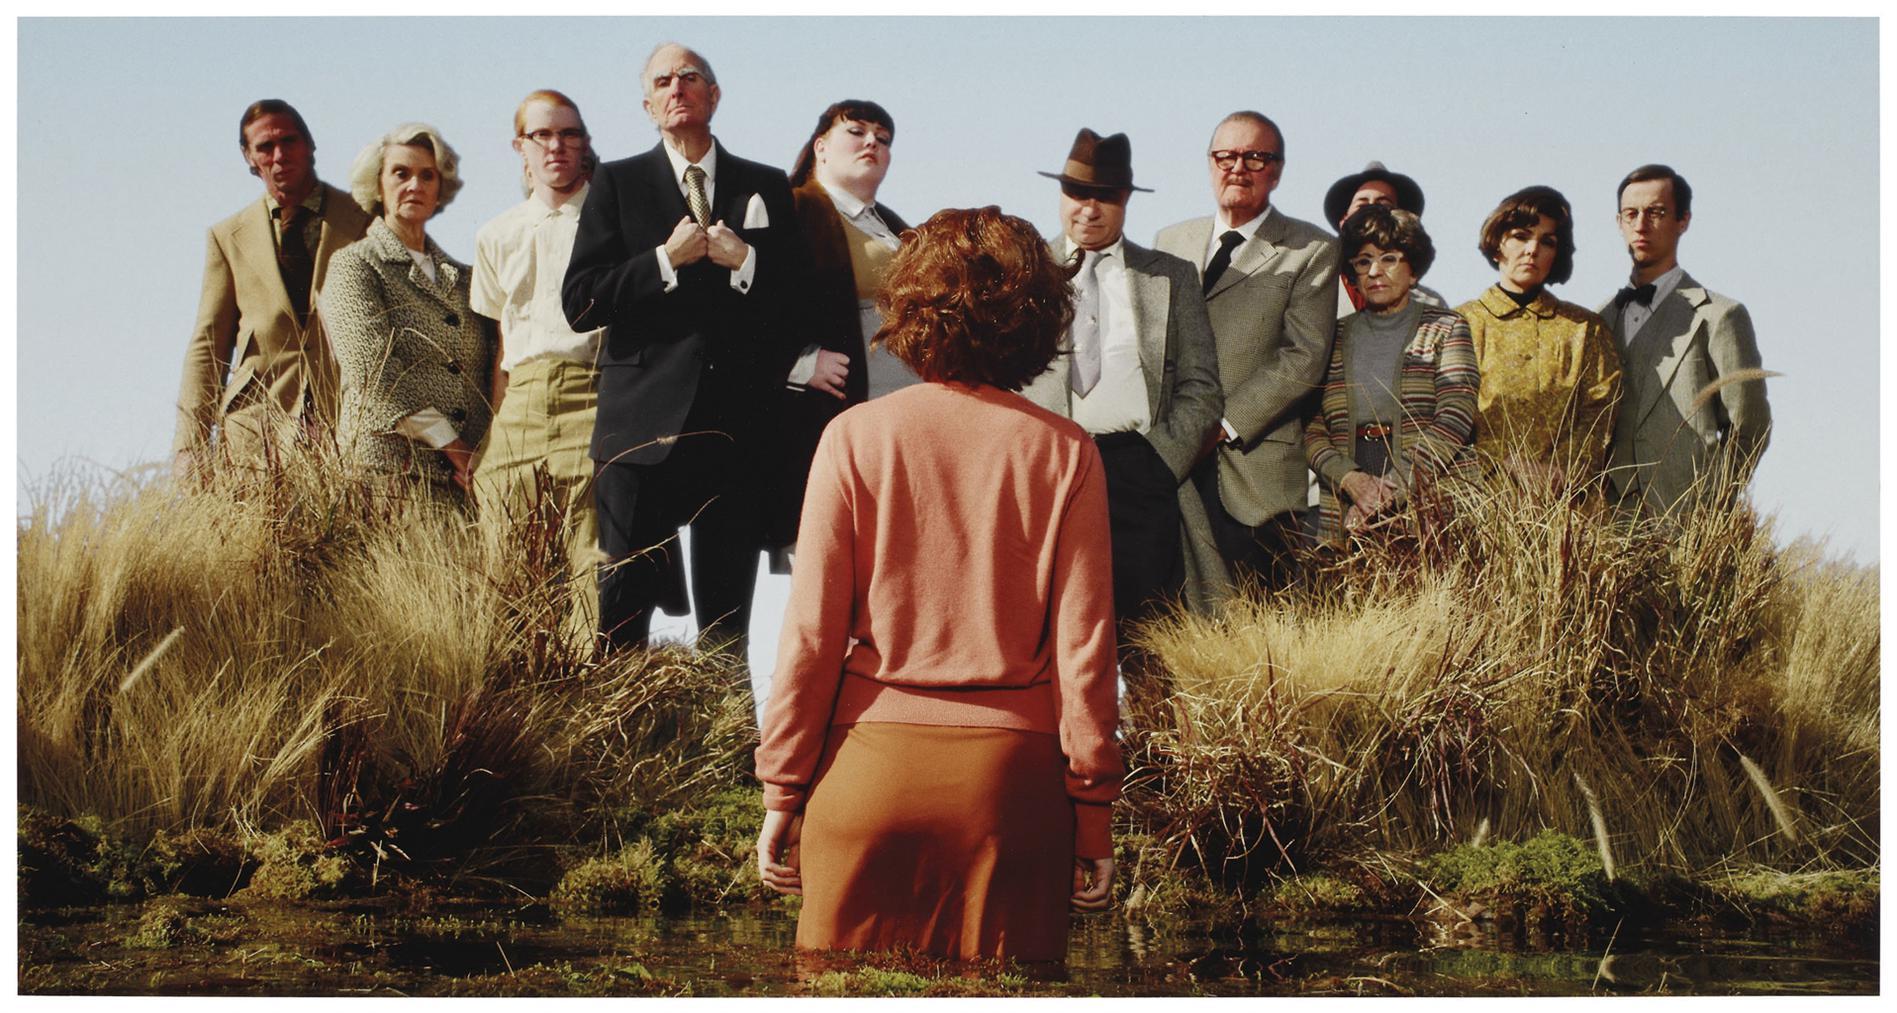 Alex Prager-Film Still# 5 From La Petite Mort-2012